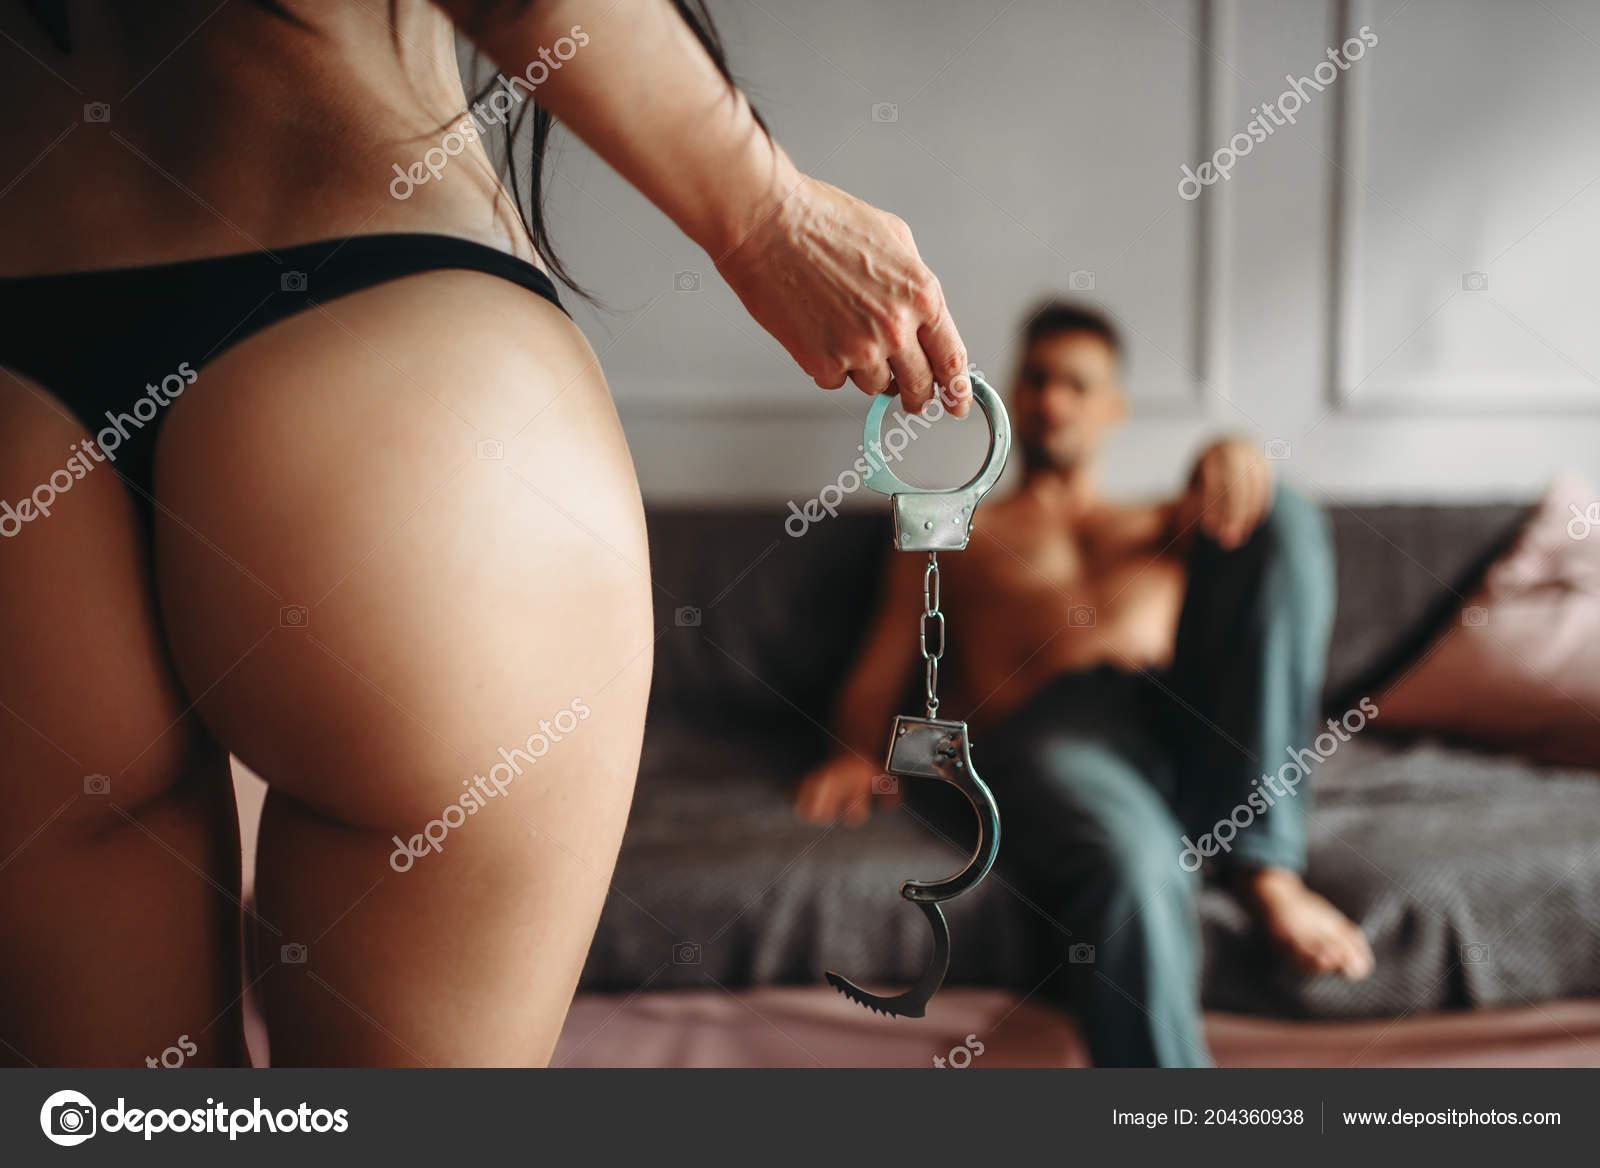 fotografii-erotika-s-naruchnikami-frantsuzskie-istoricheskie-porno-filmi